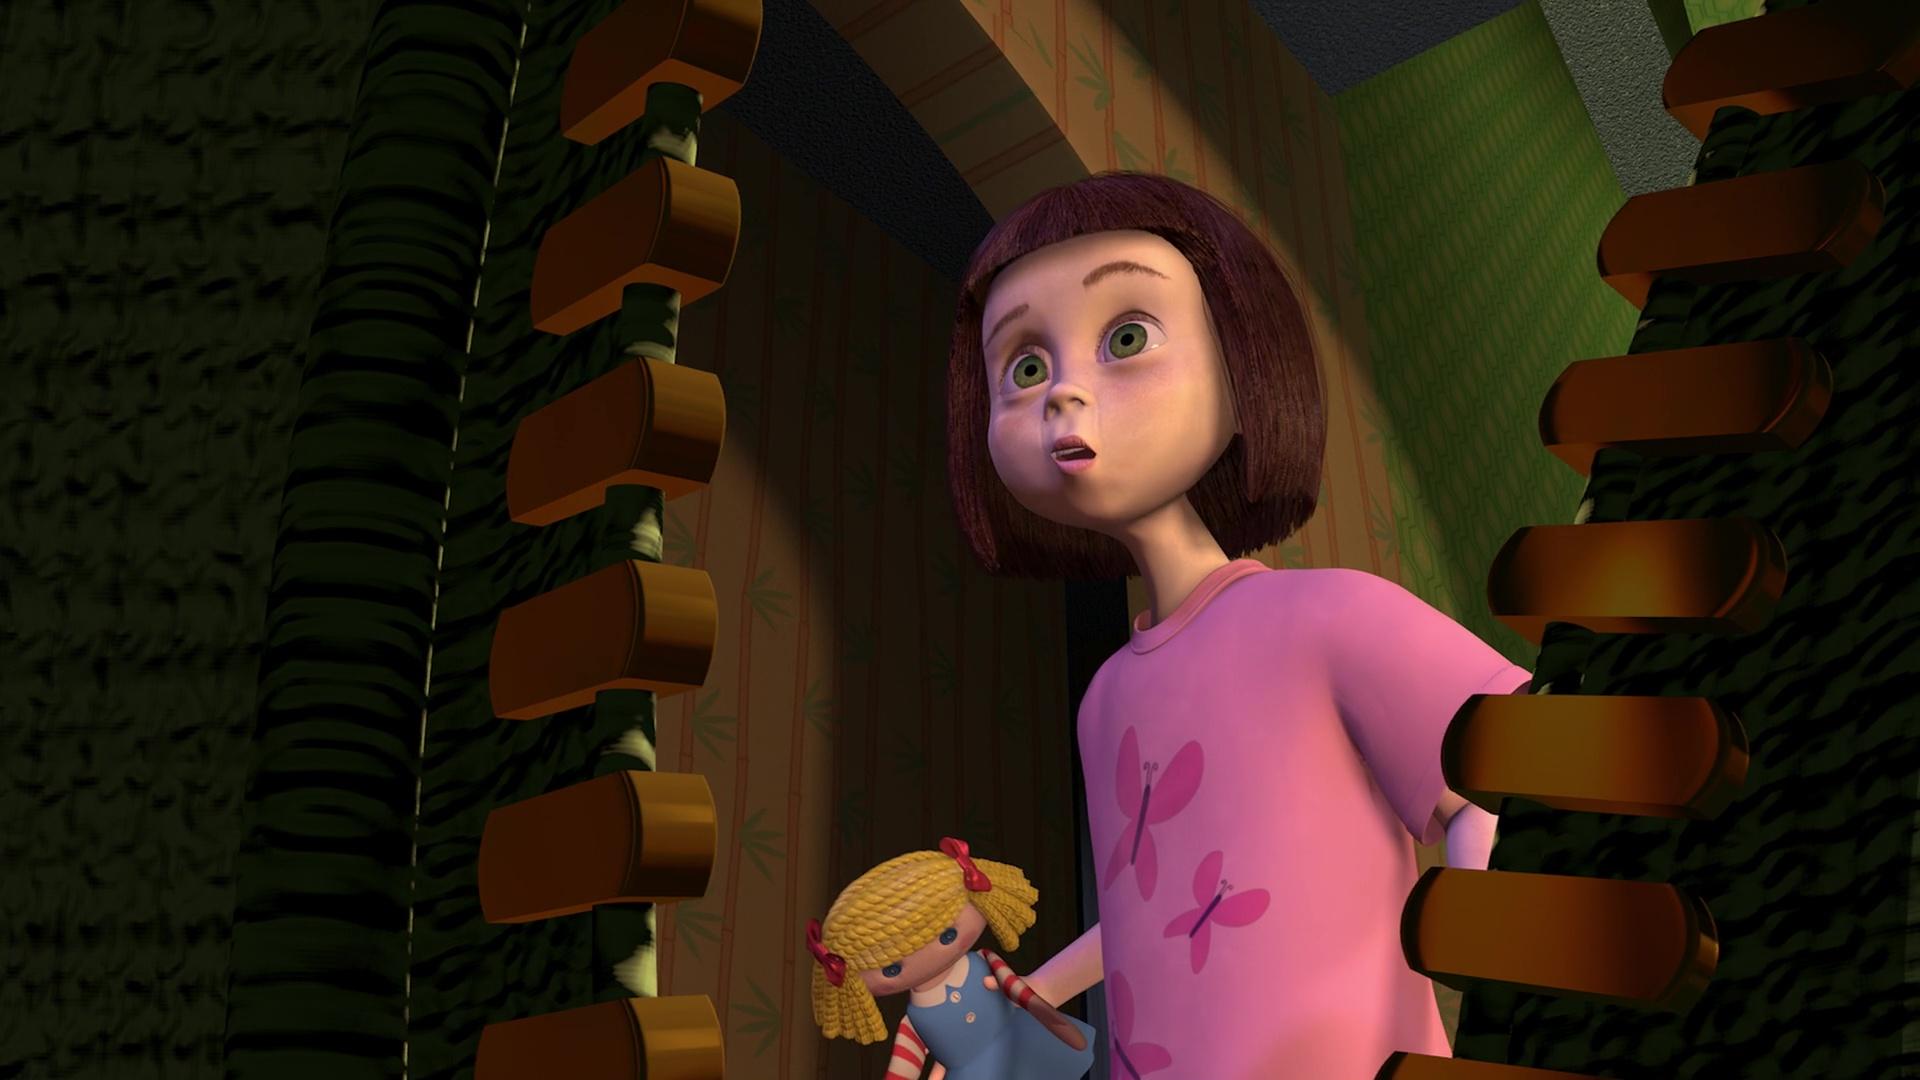 Toy Story Hannah : Hannah phillips pixar wiki fandom powered by wikia